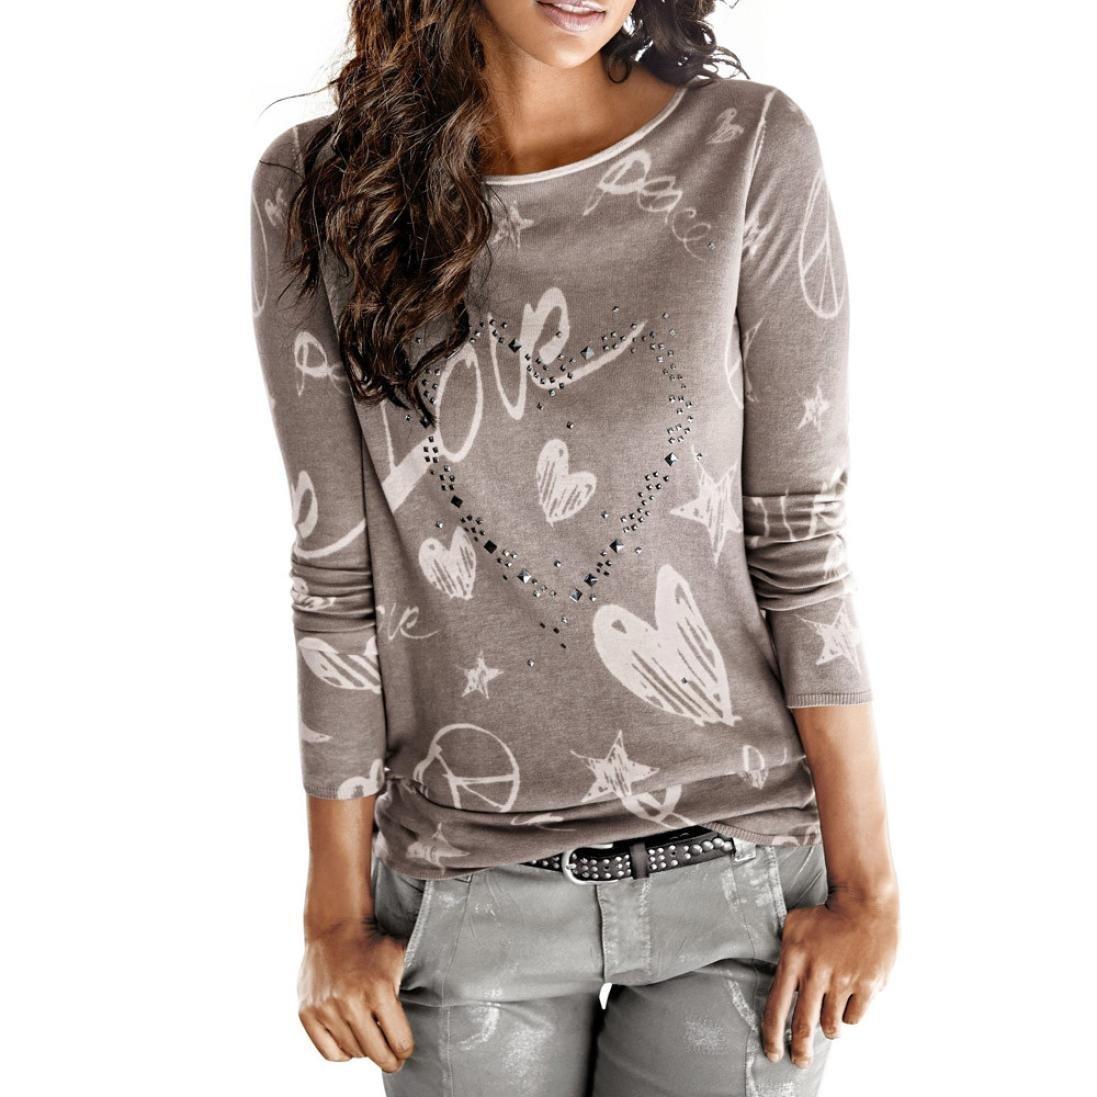 Camisa de mujer Manga larga O-cuello Carta Impreso Algodón Casual Suelto Blusa Tops Camiseta LMMVP